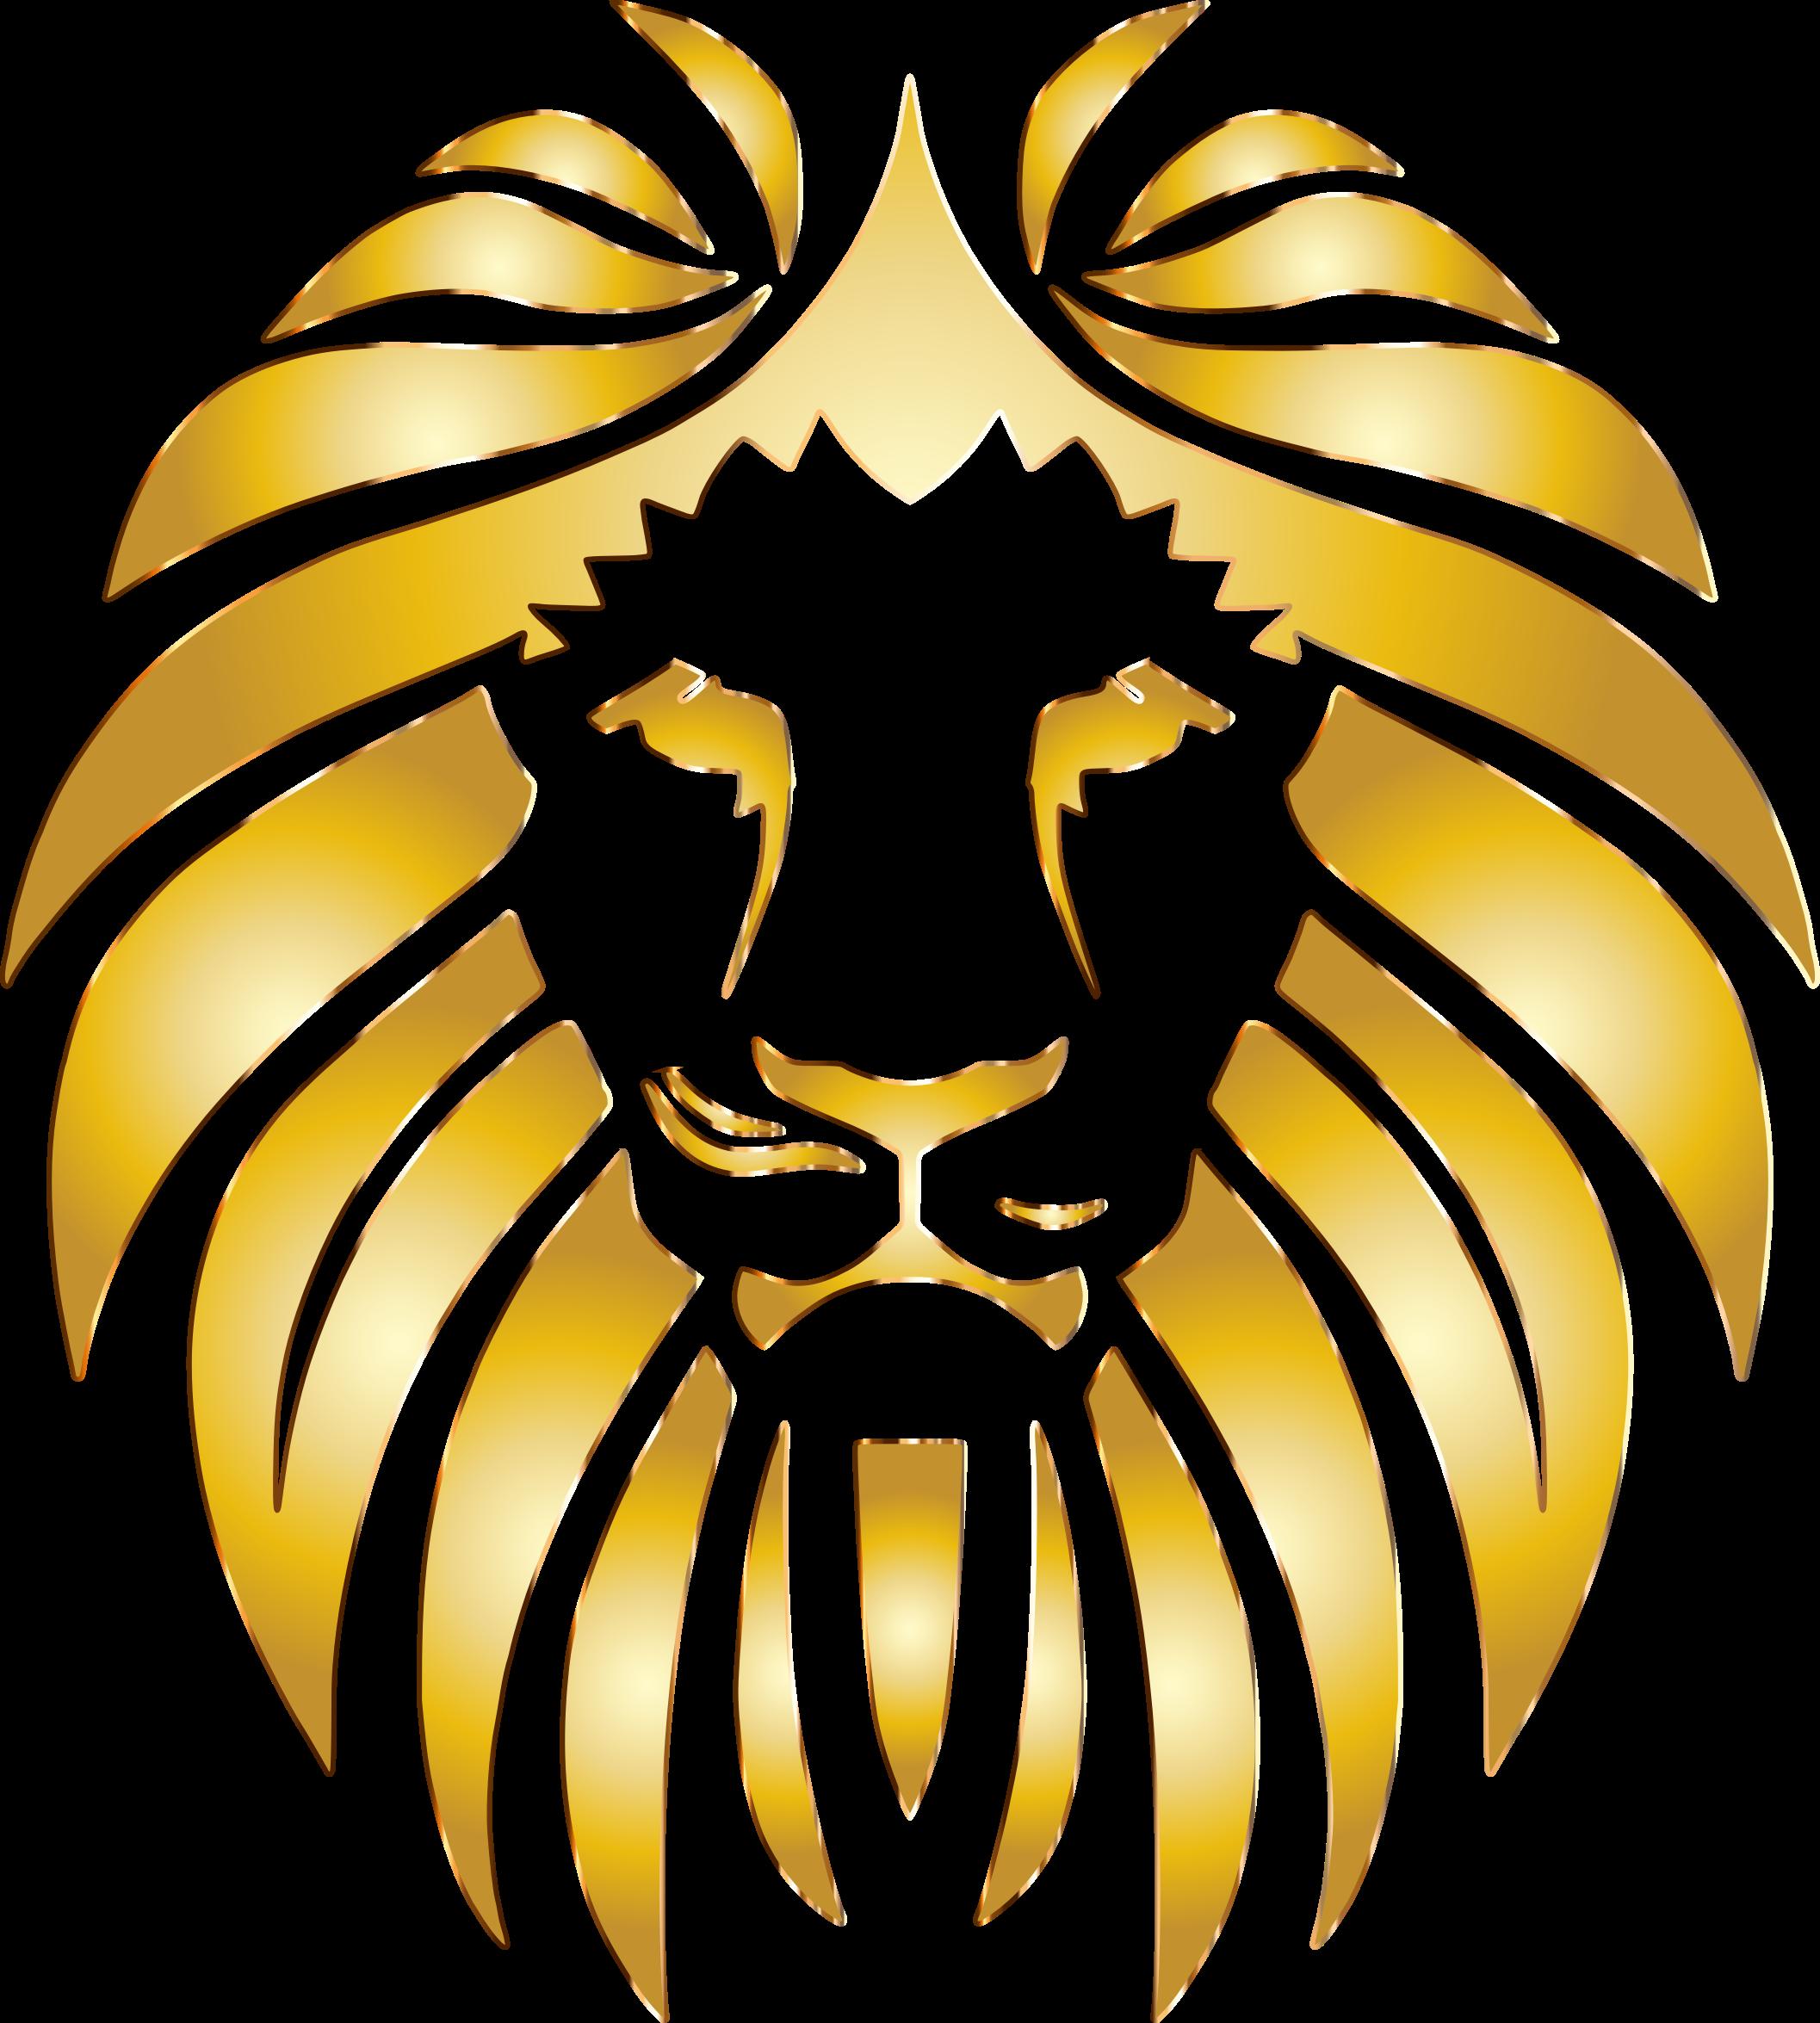 png black and white Golden clipart transparent. Lion no background big